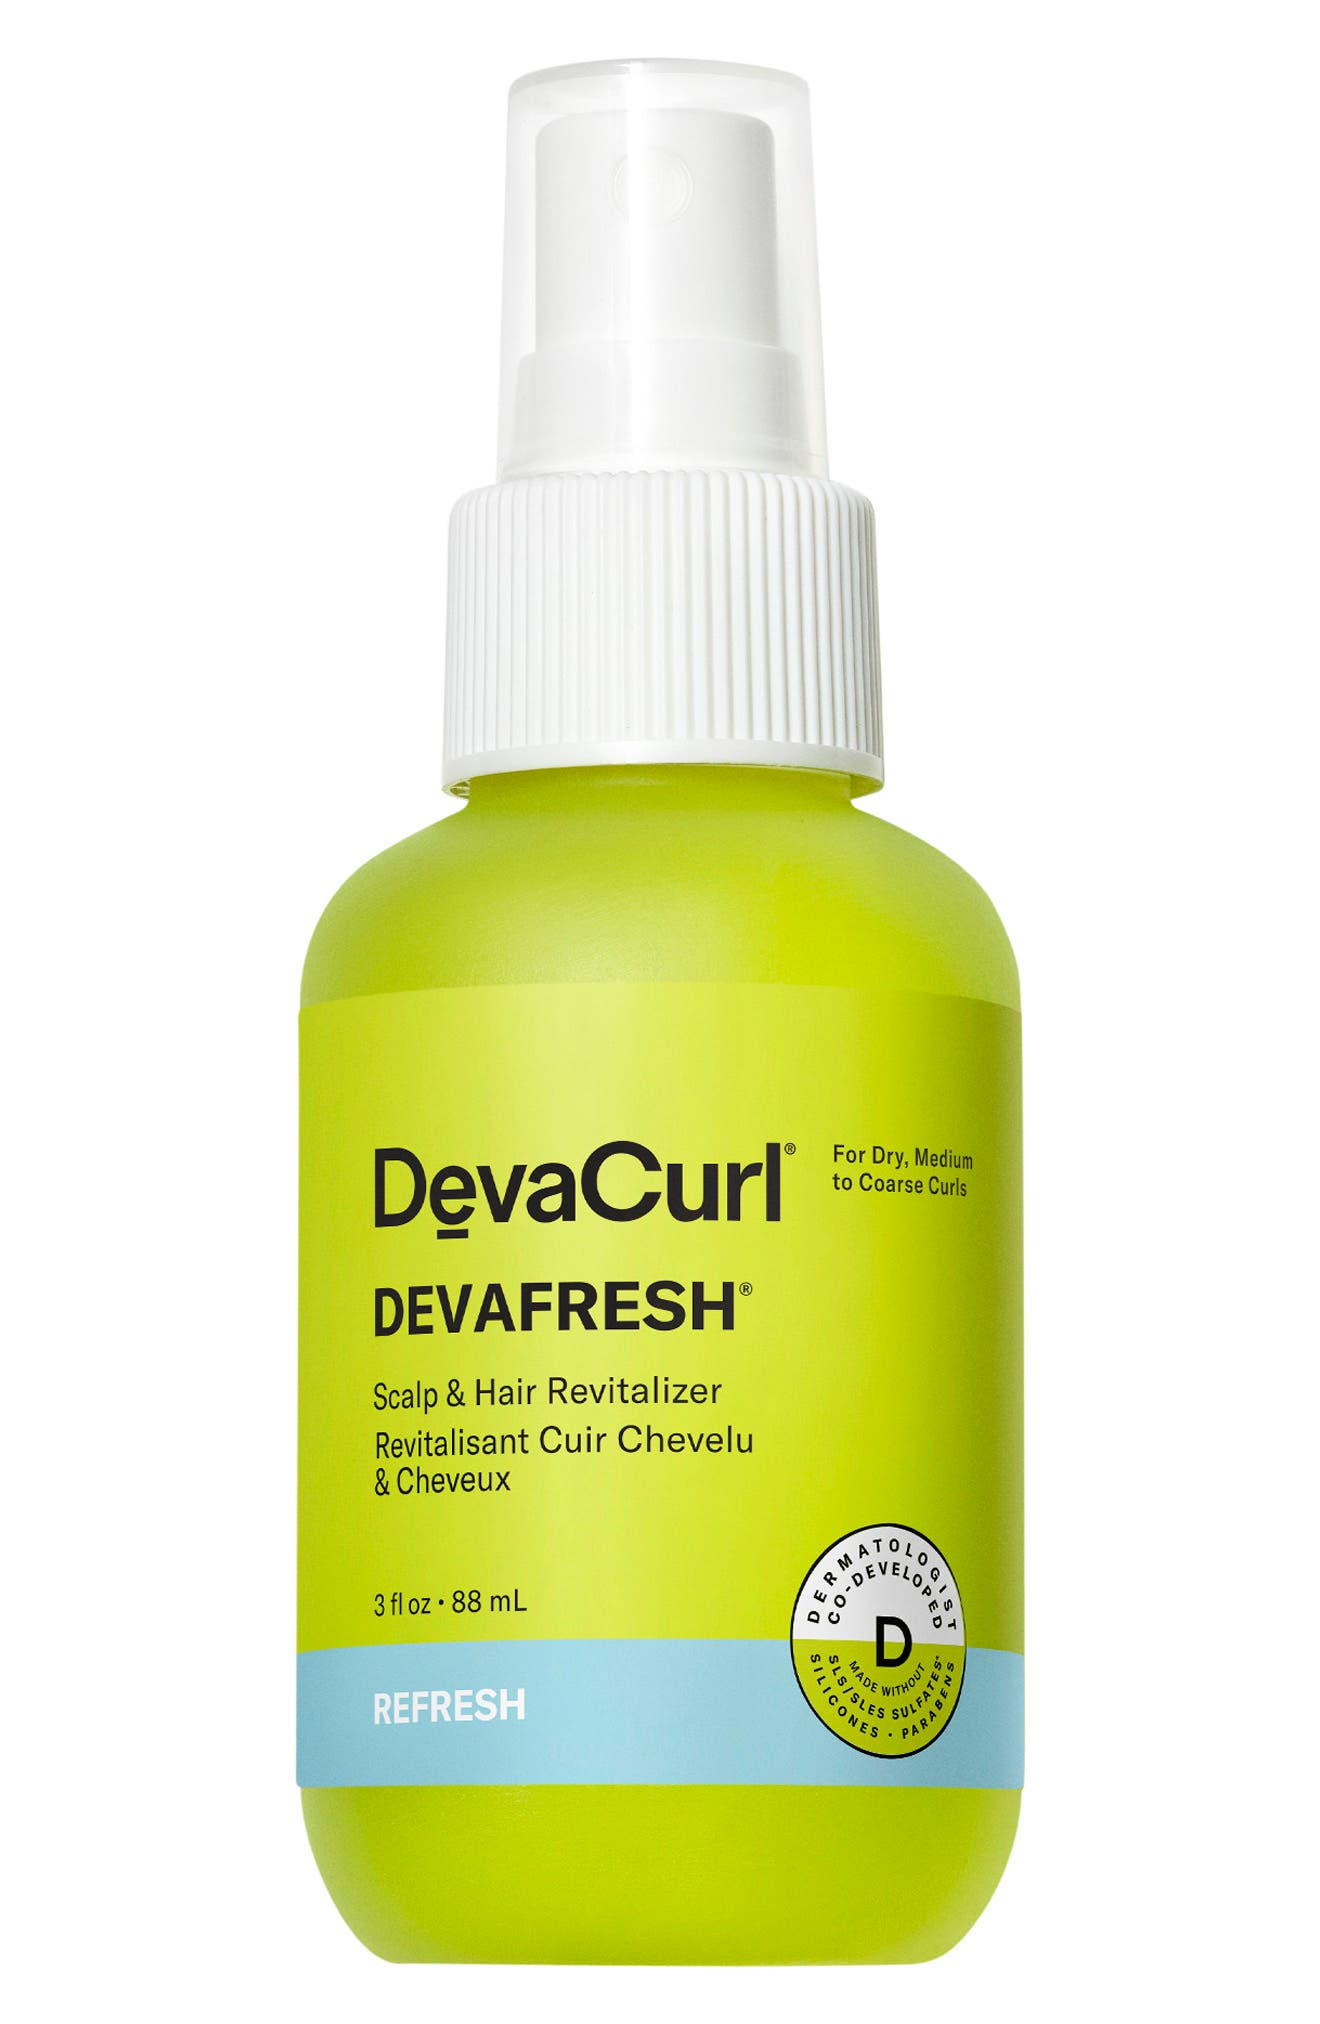 Devafresh Scalp & Hair Revitalizer